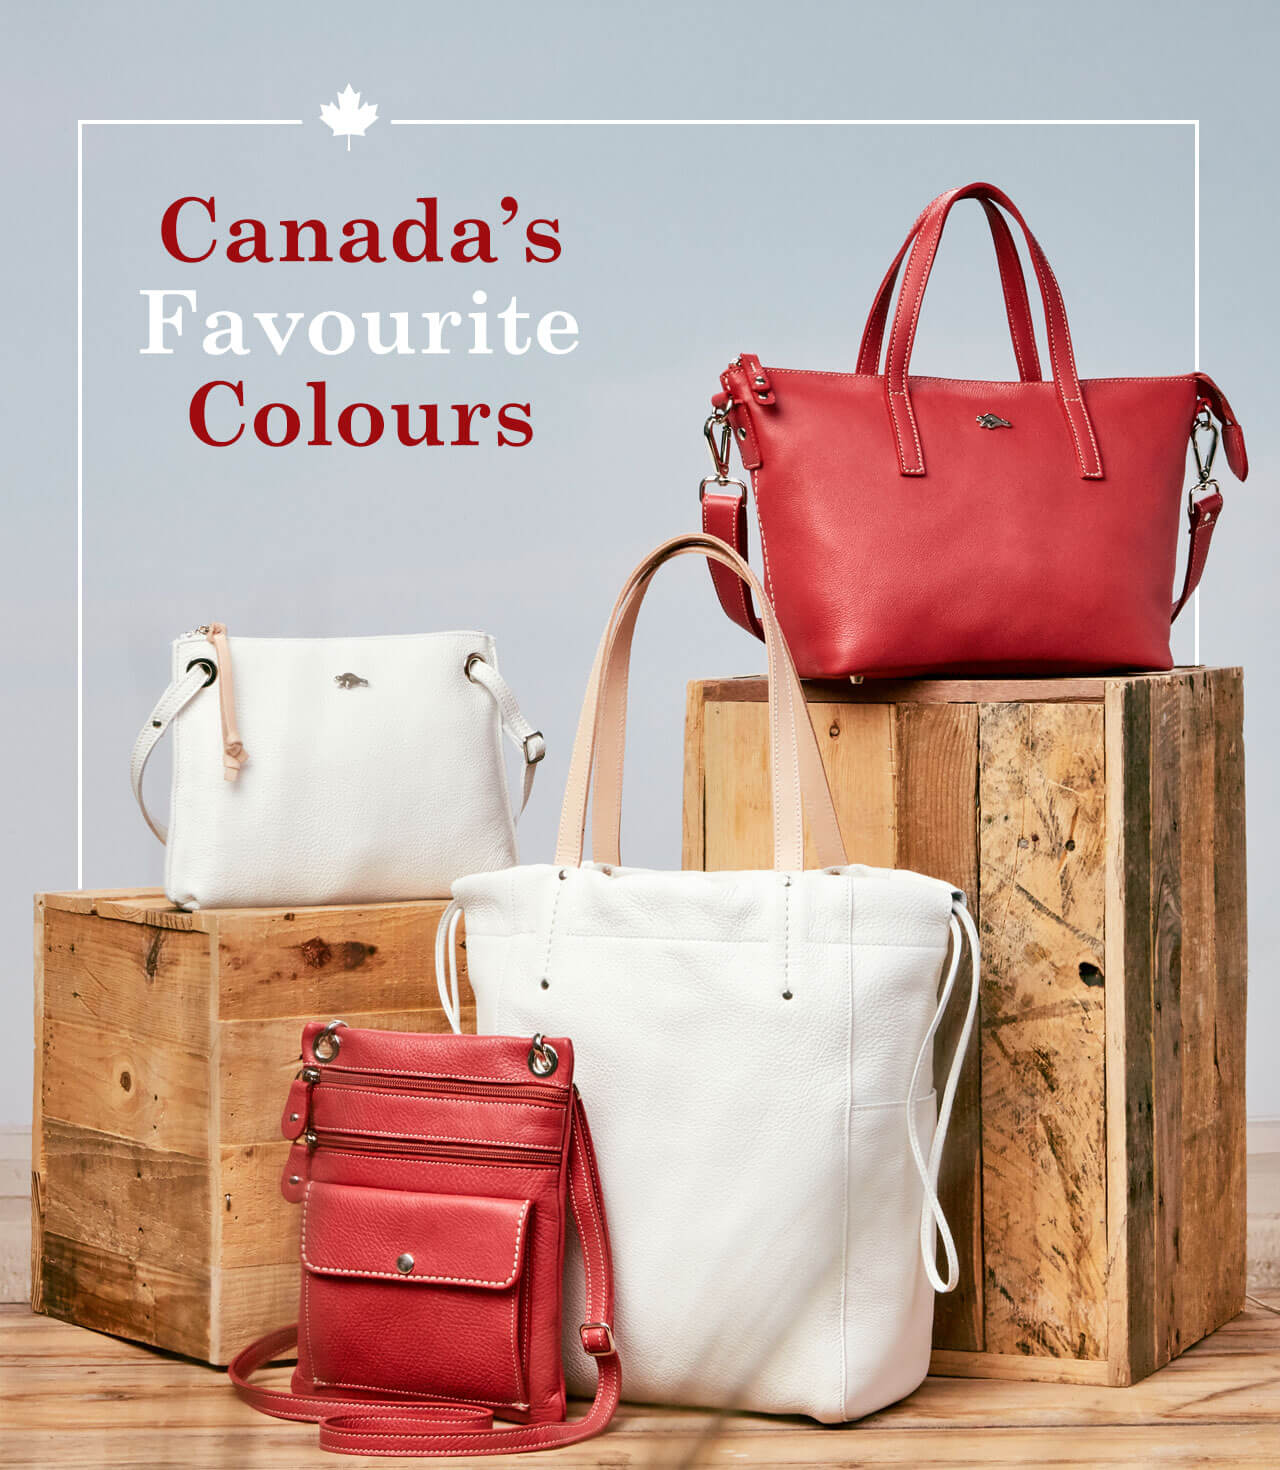 Canada's Favourite Colours